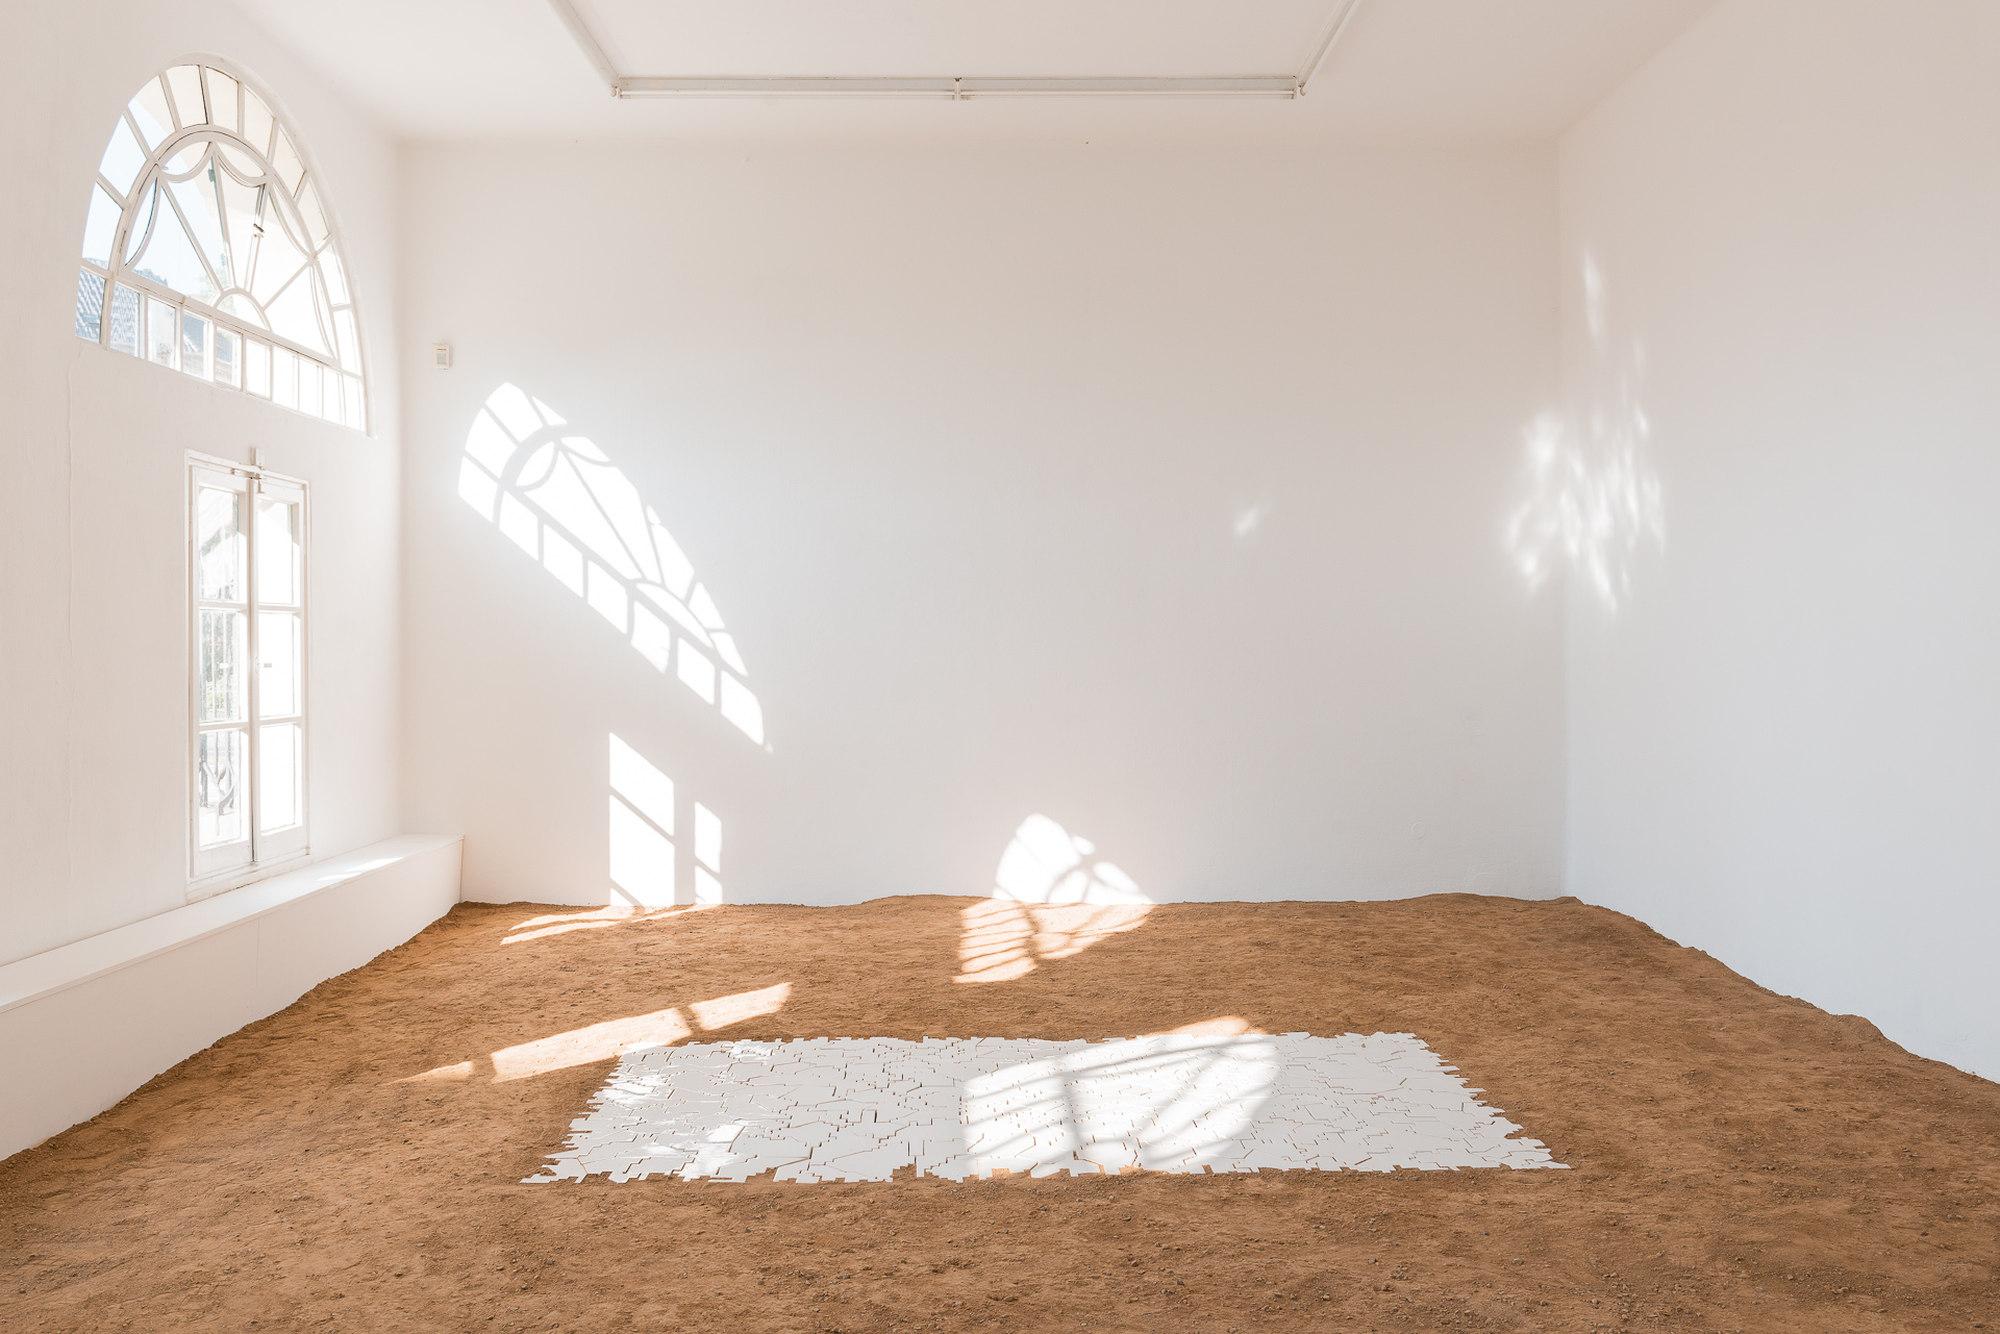 Anca Munteanu Rimnic at Kunstverein Braunschweig 4